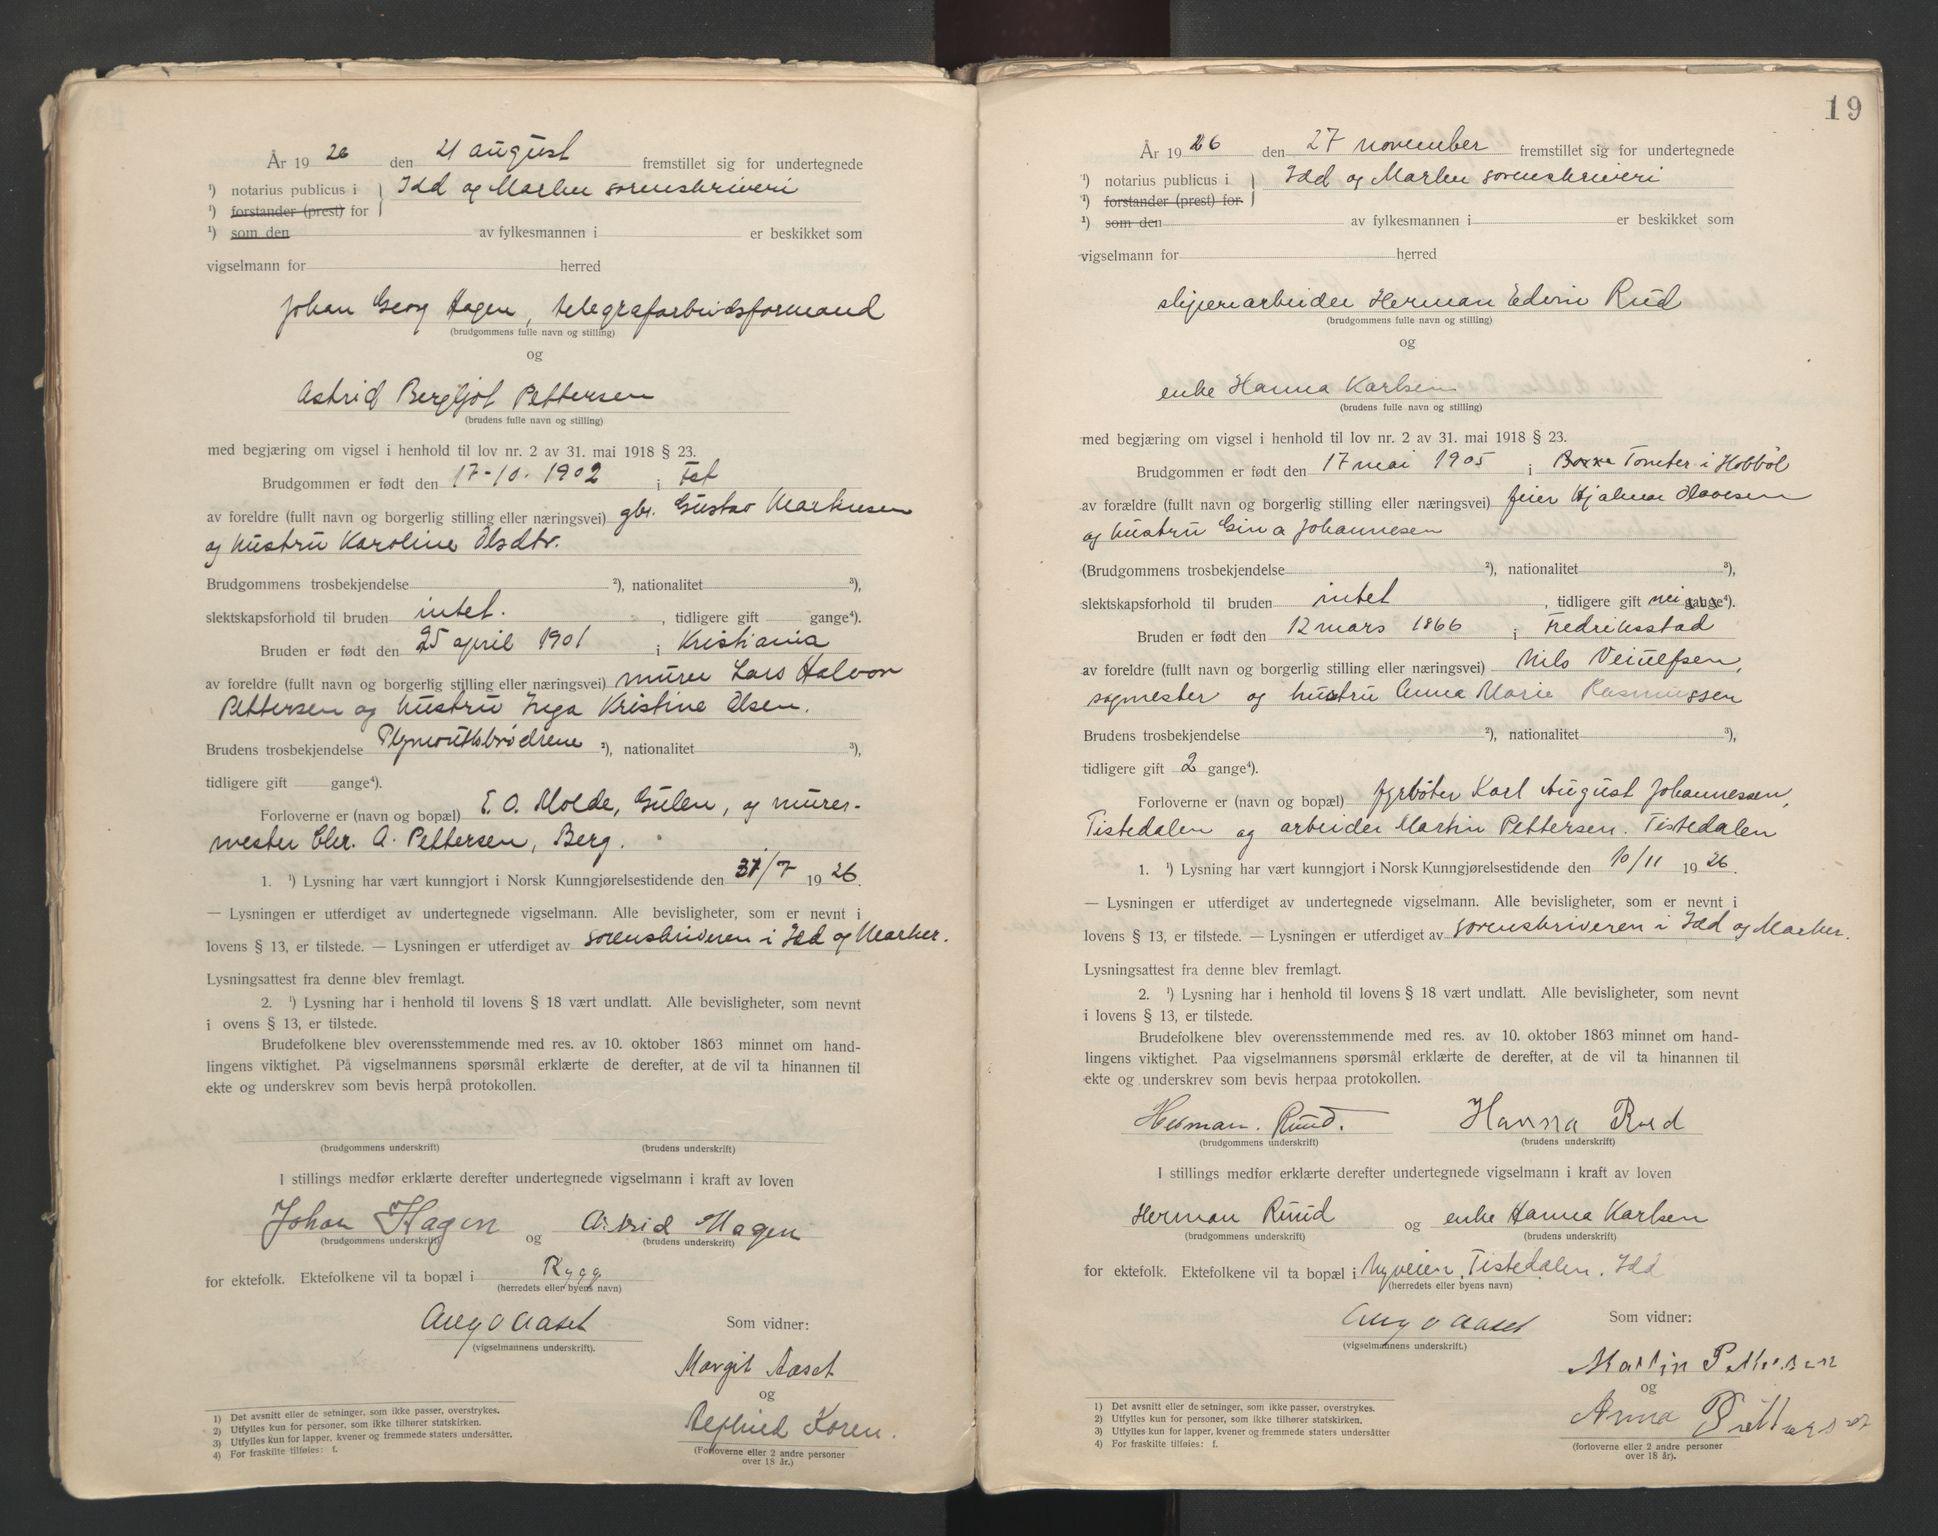 SAO, Idd og Marker sorenskriveri, L/Lc/L0001: Vigselsbøker, 1920-1942, s. 19